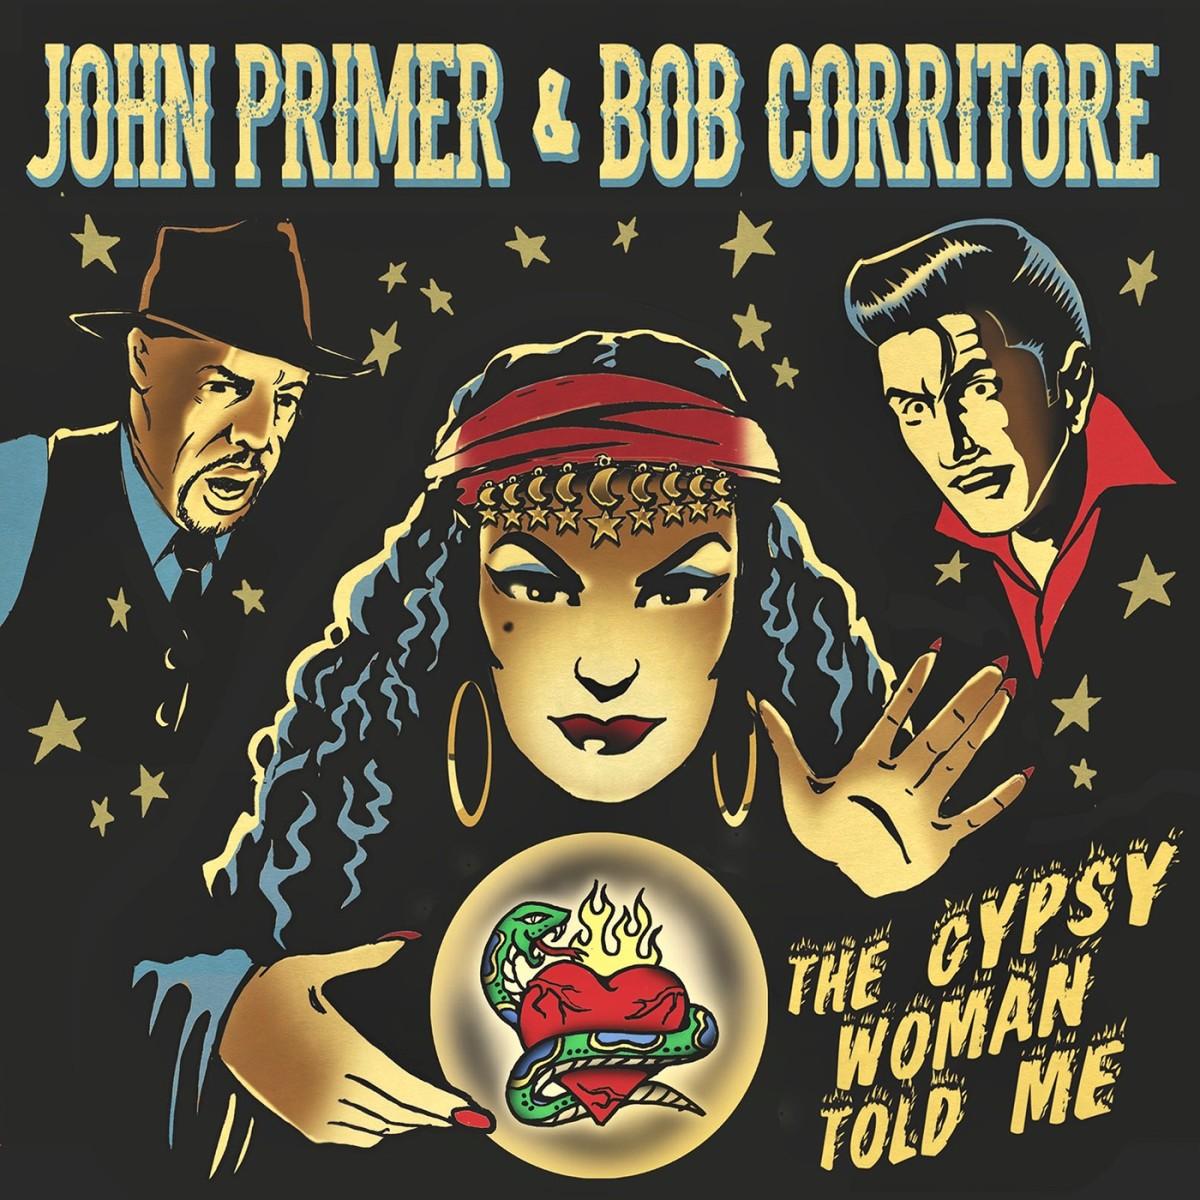 John Primer and Bob Corritone